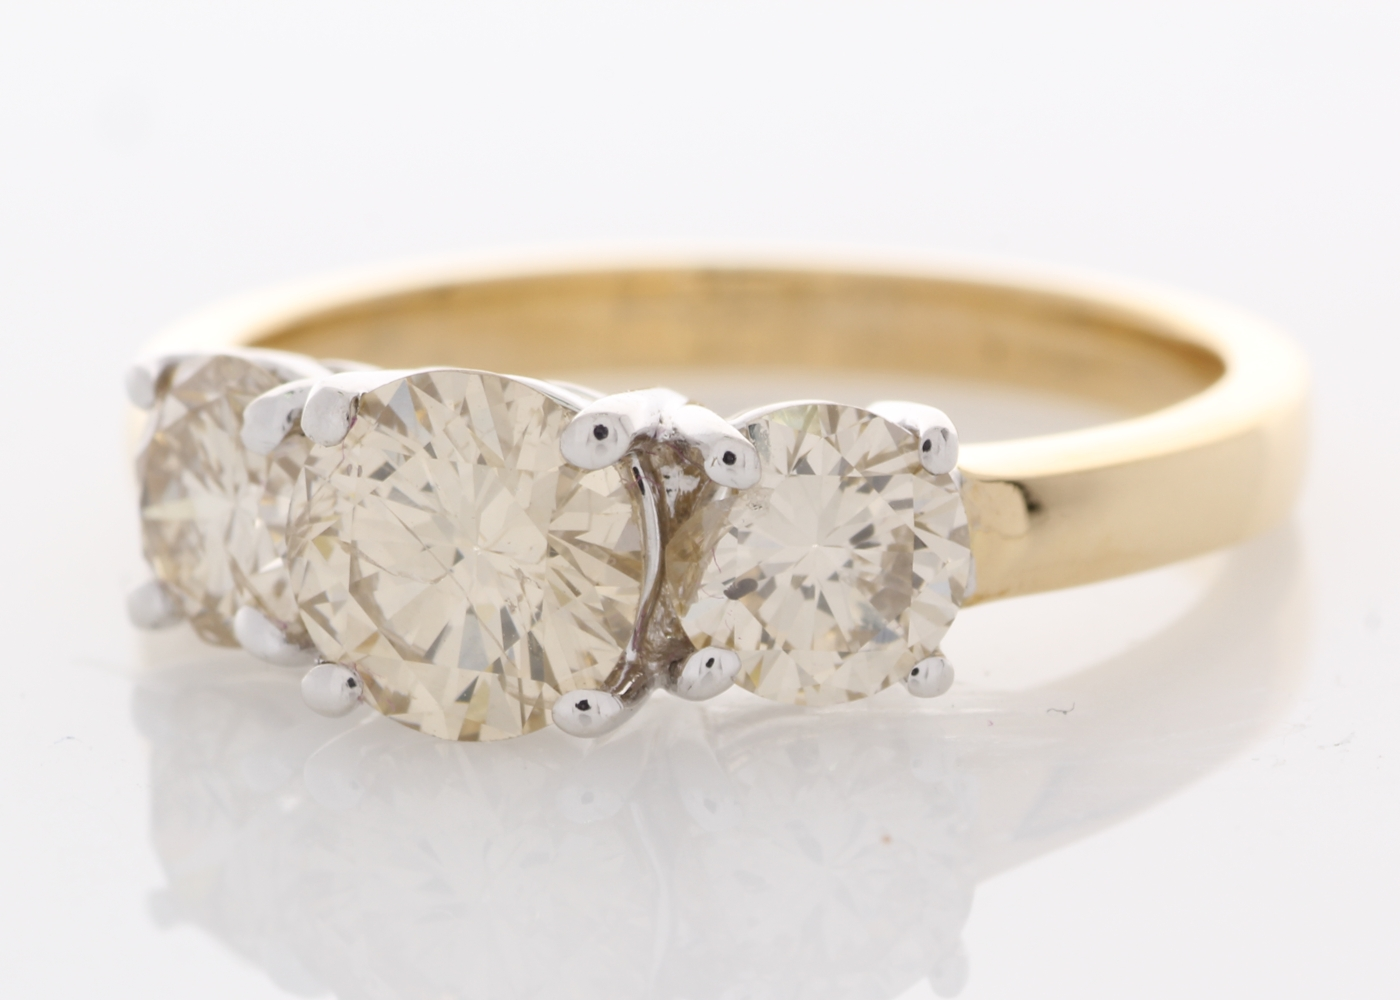 Lot 8 - 18ct Yellow Gold Three Stone Claw Set Diamond Ring 2.43 Carats